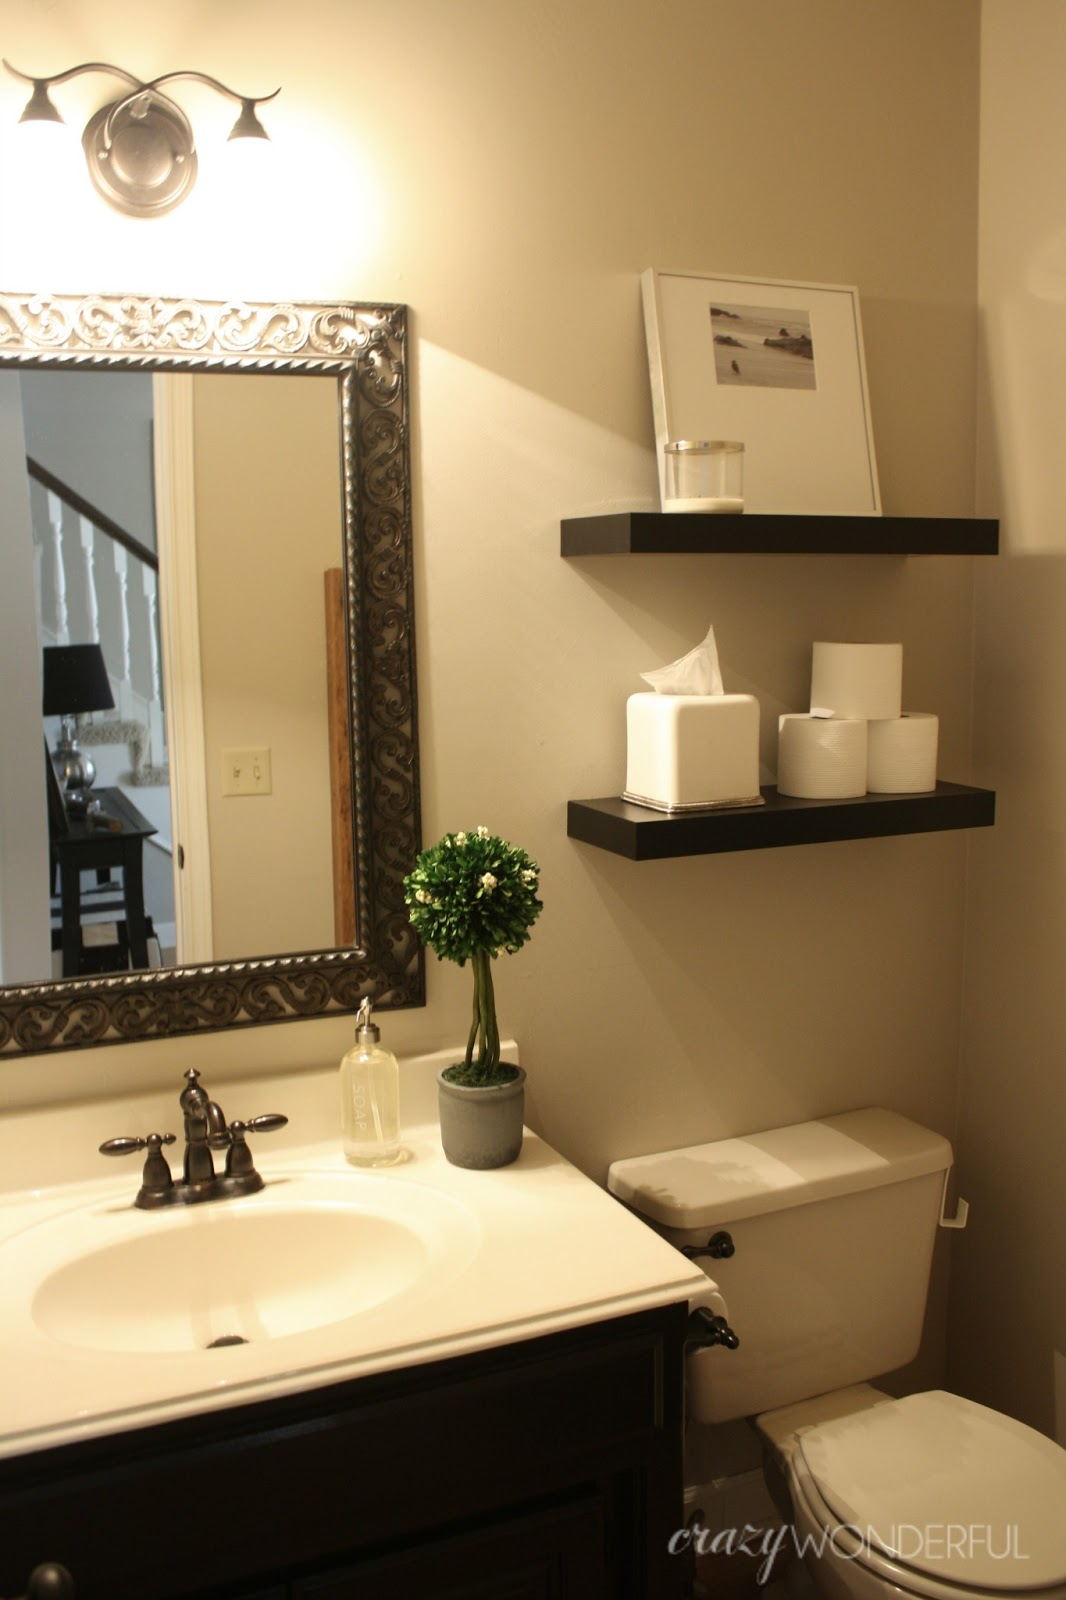 quick powder room makeover - Crazy Wonderful on Small Apartment Bathroom Ideas  id=63742